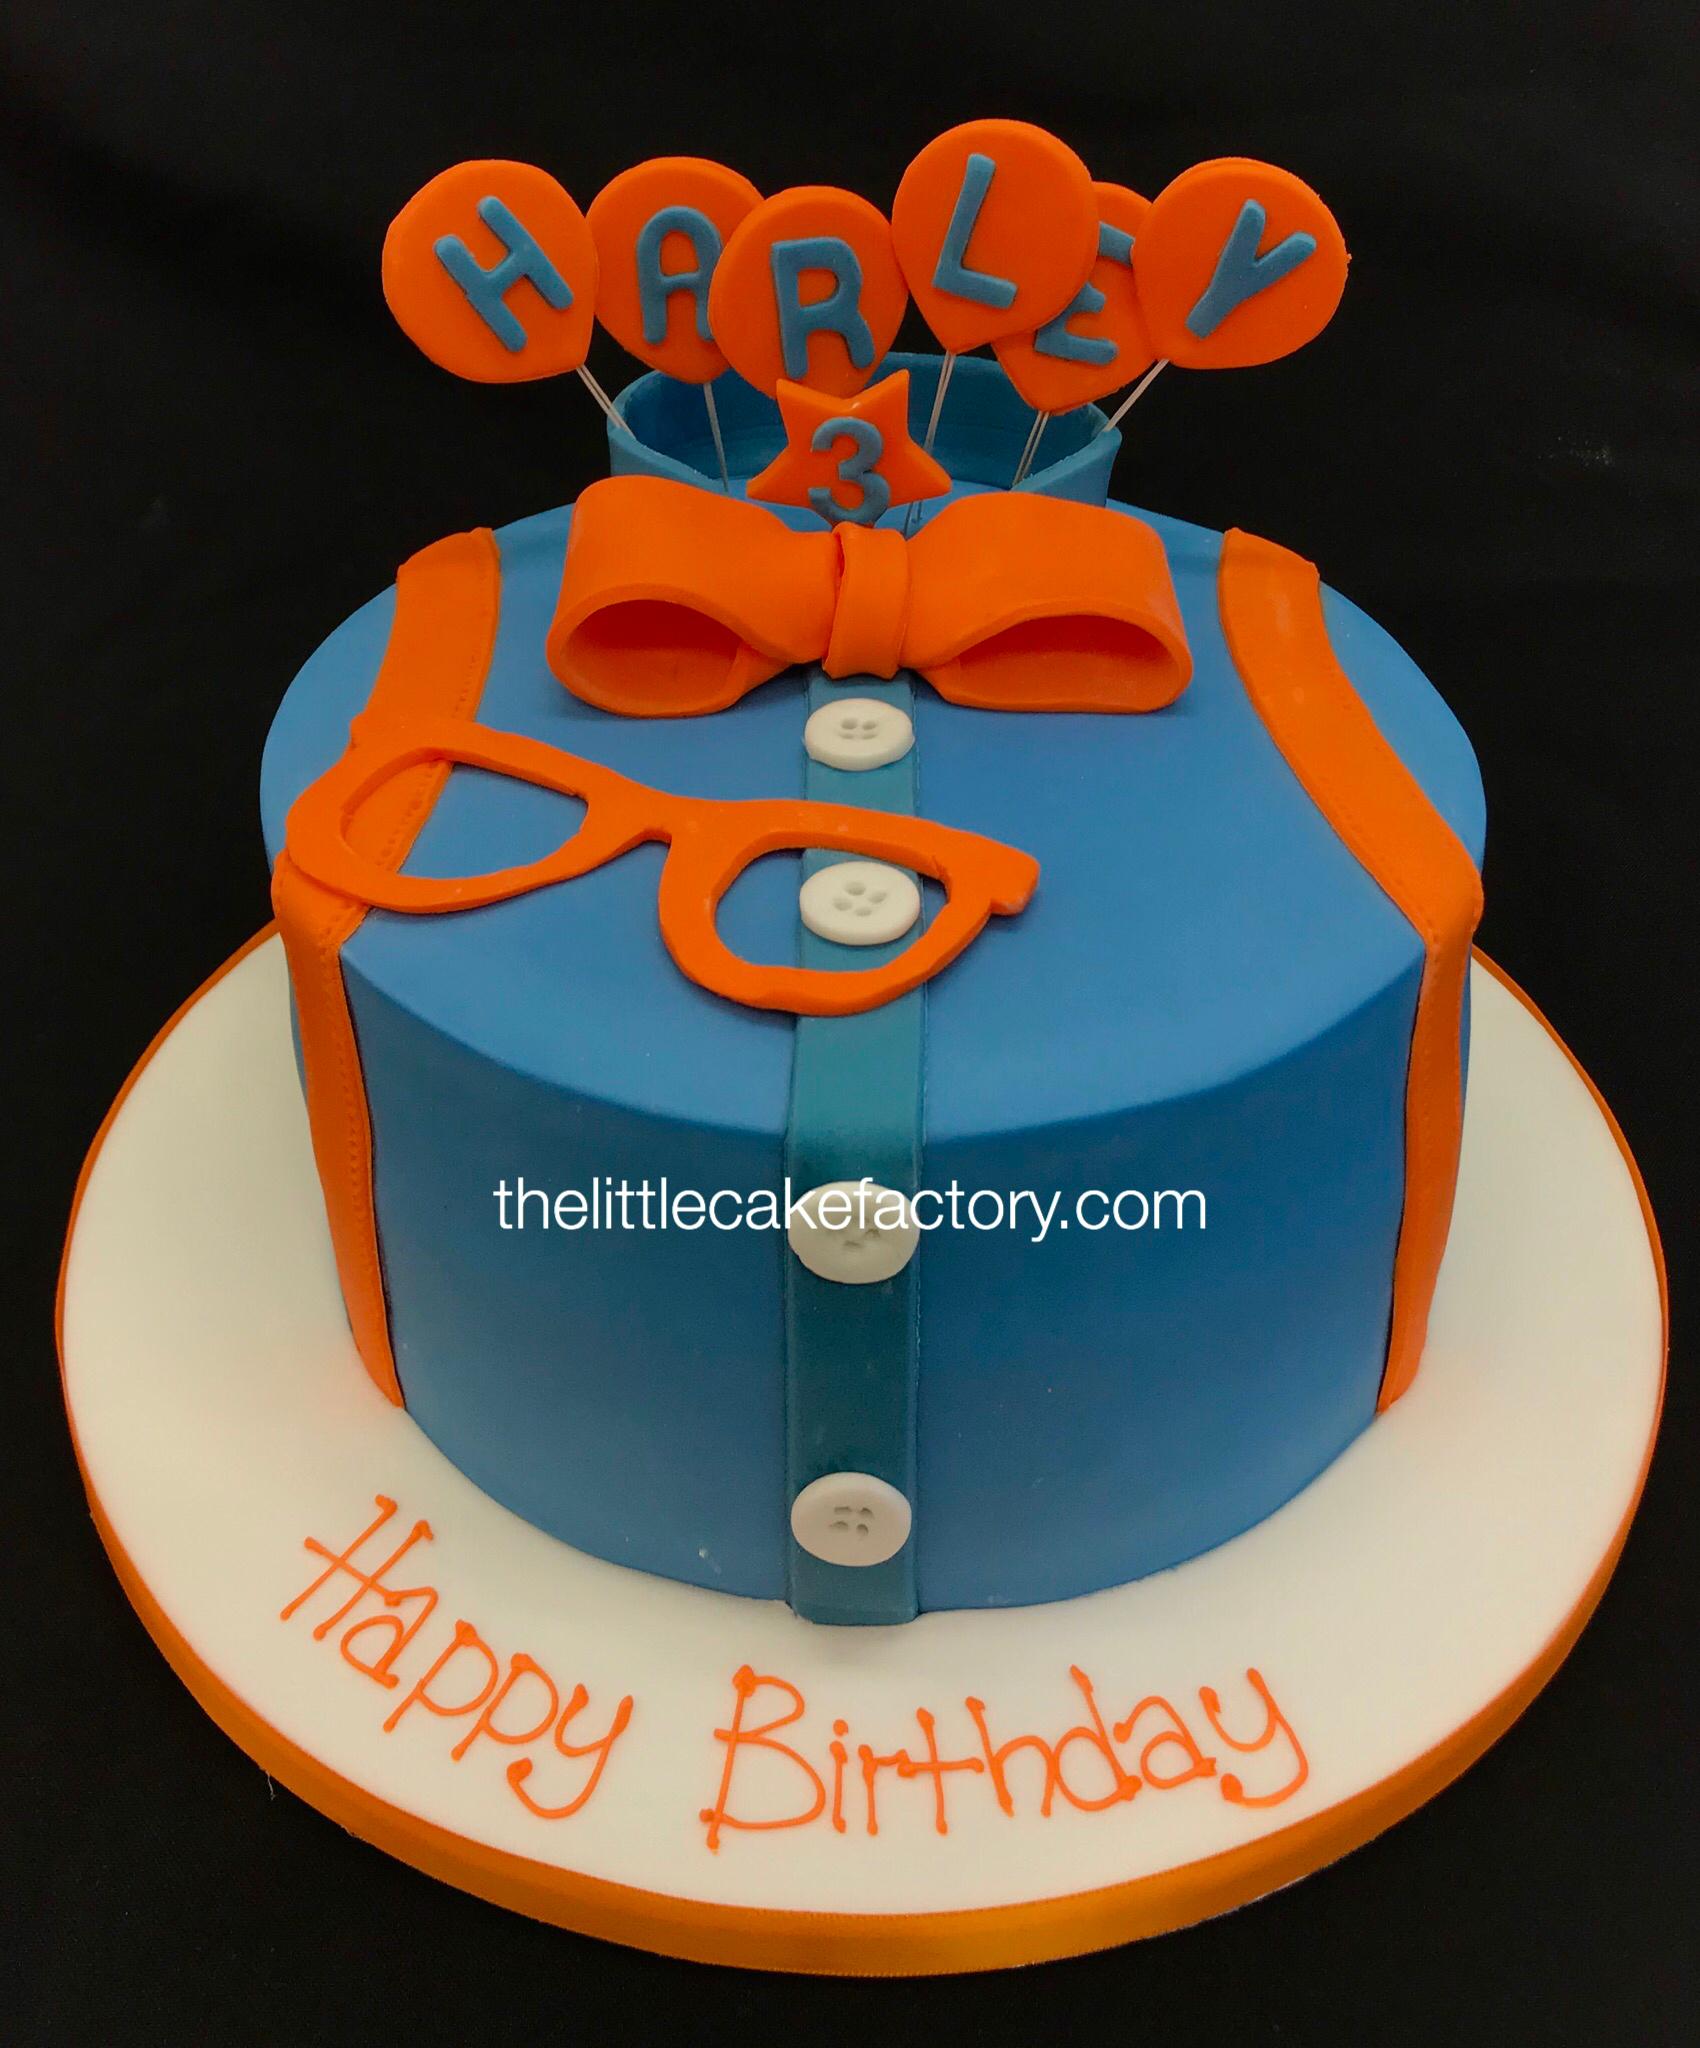 Birthday Cakes Wedding Cakes Bar Mitzvah Cakes Essex